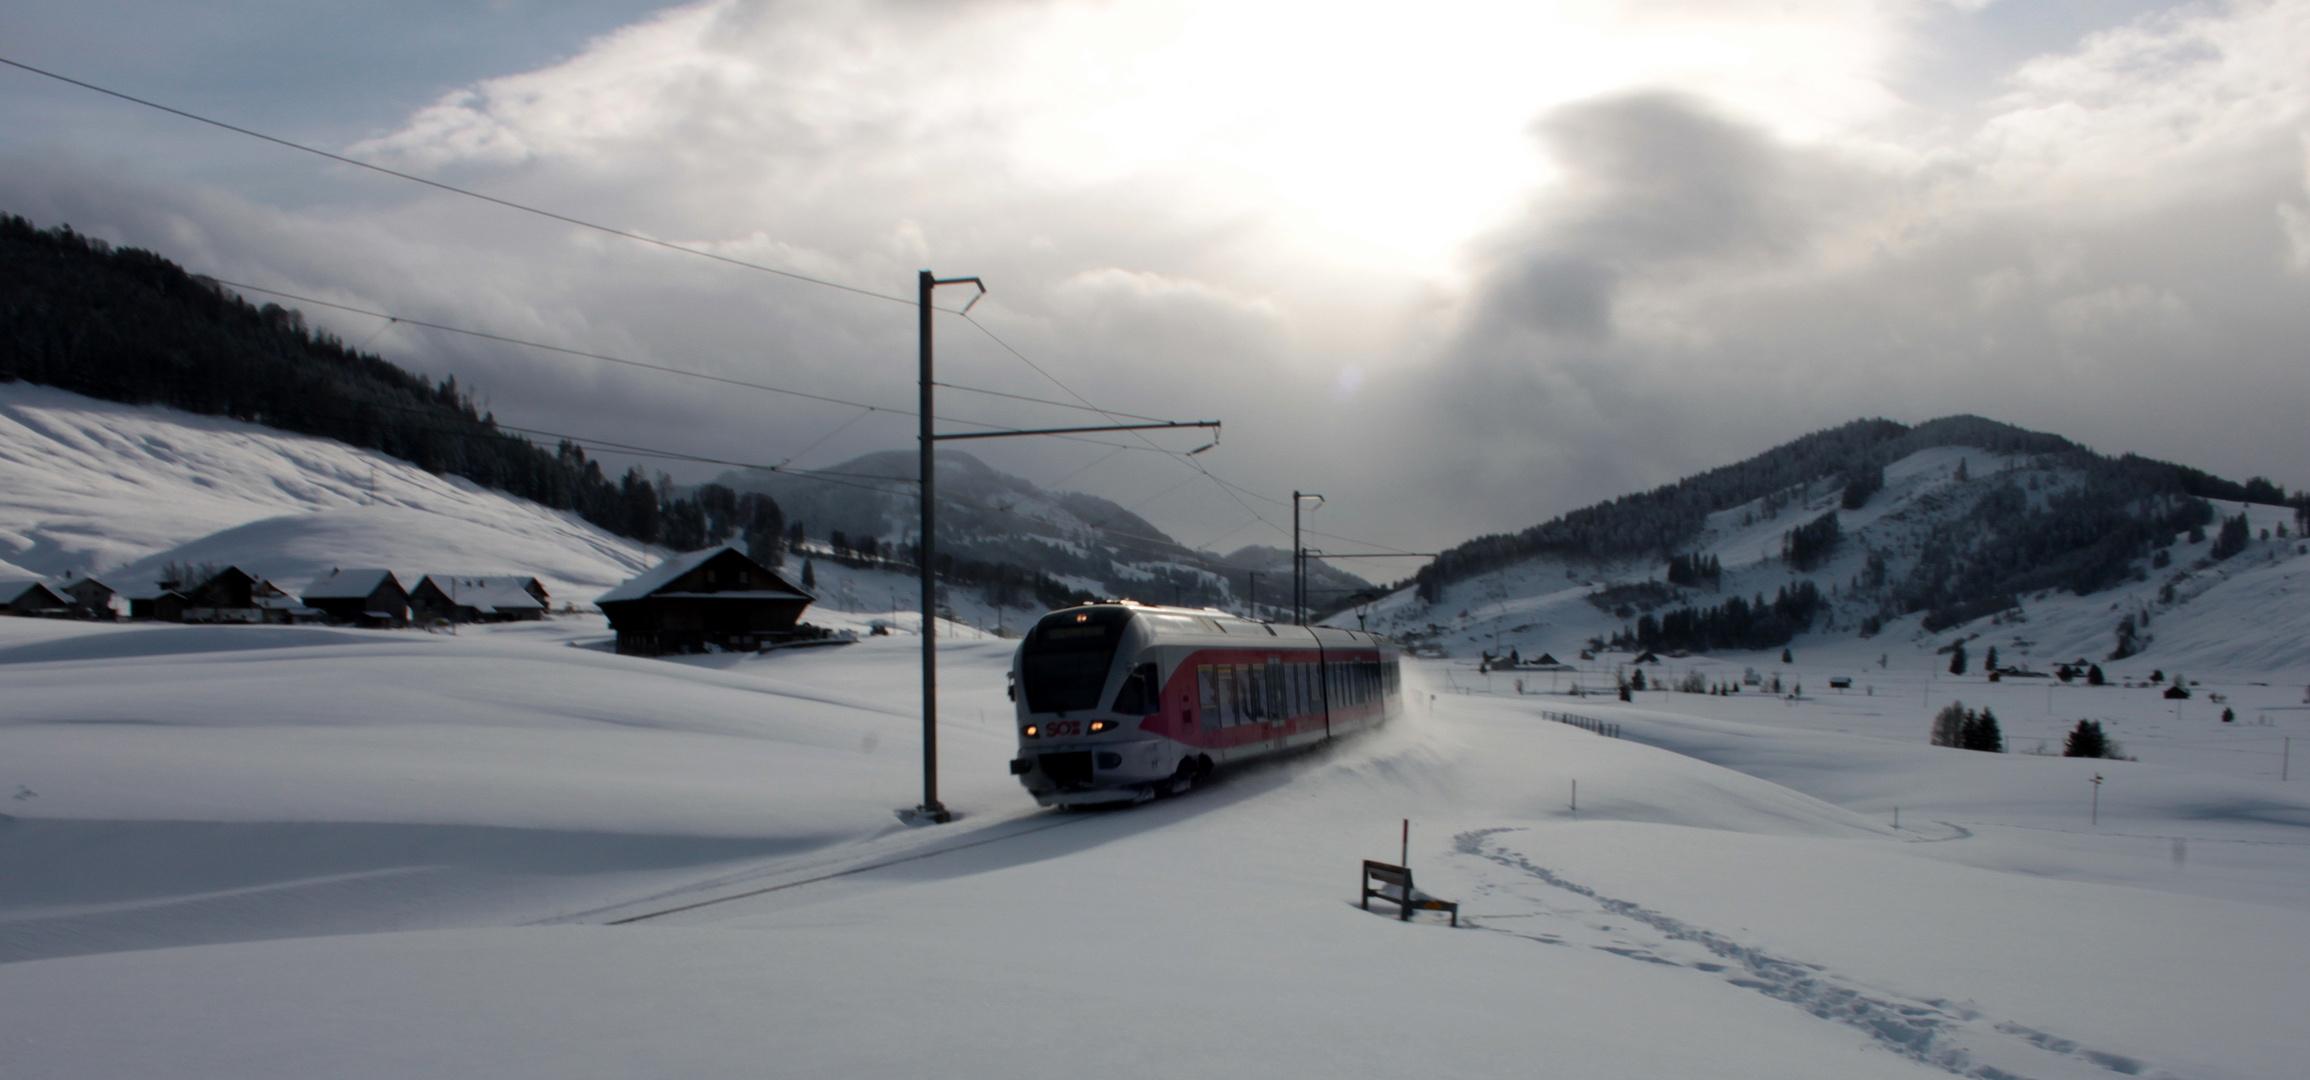 El inivierno llegó / L'hiver est arrivé / Der Winter ist angekommen..01